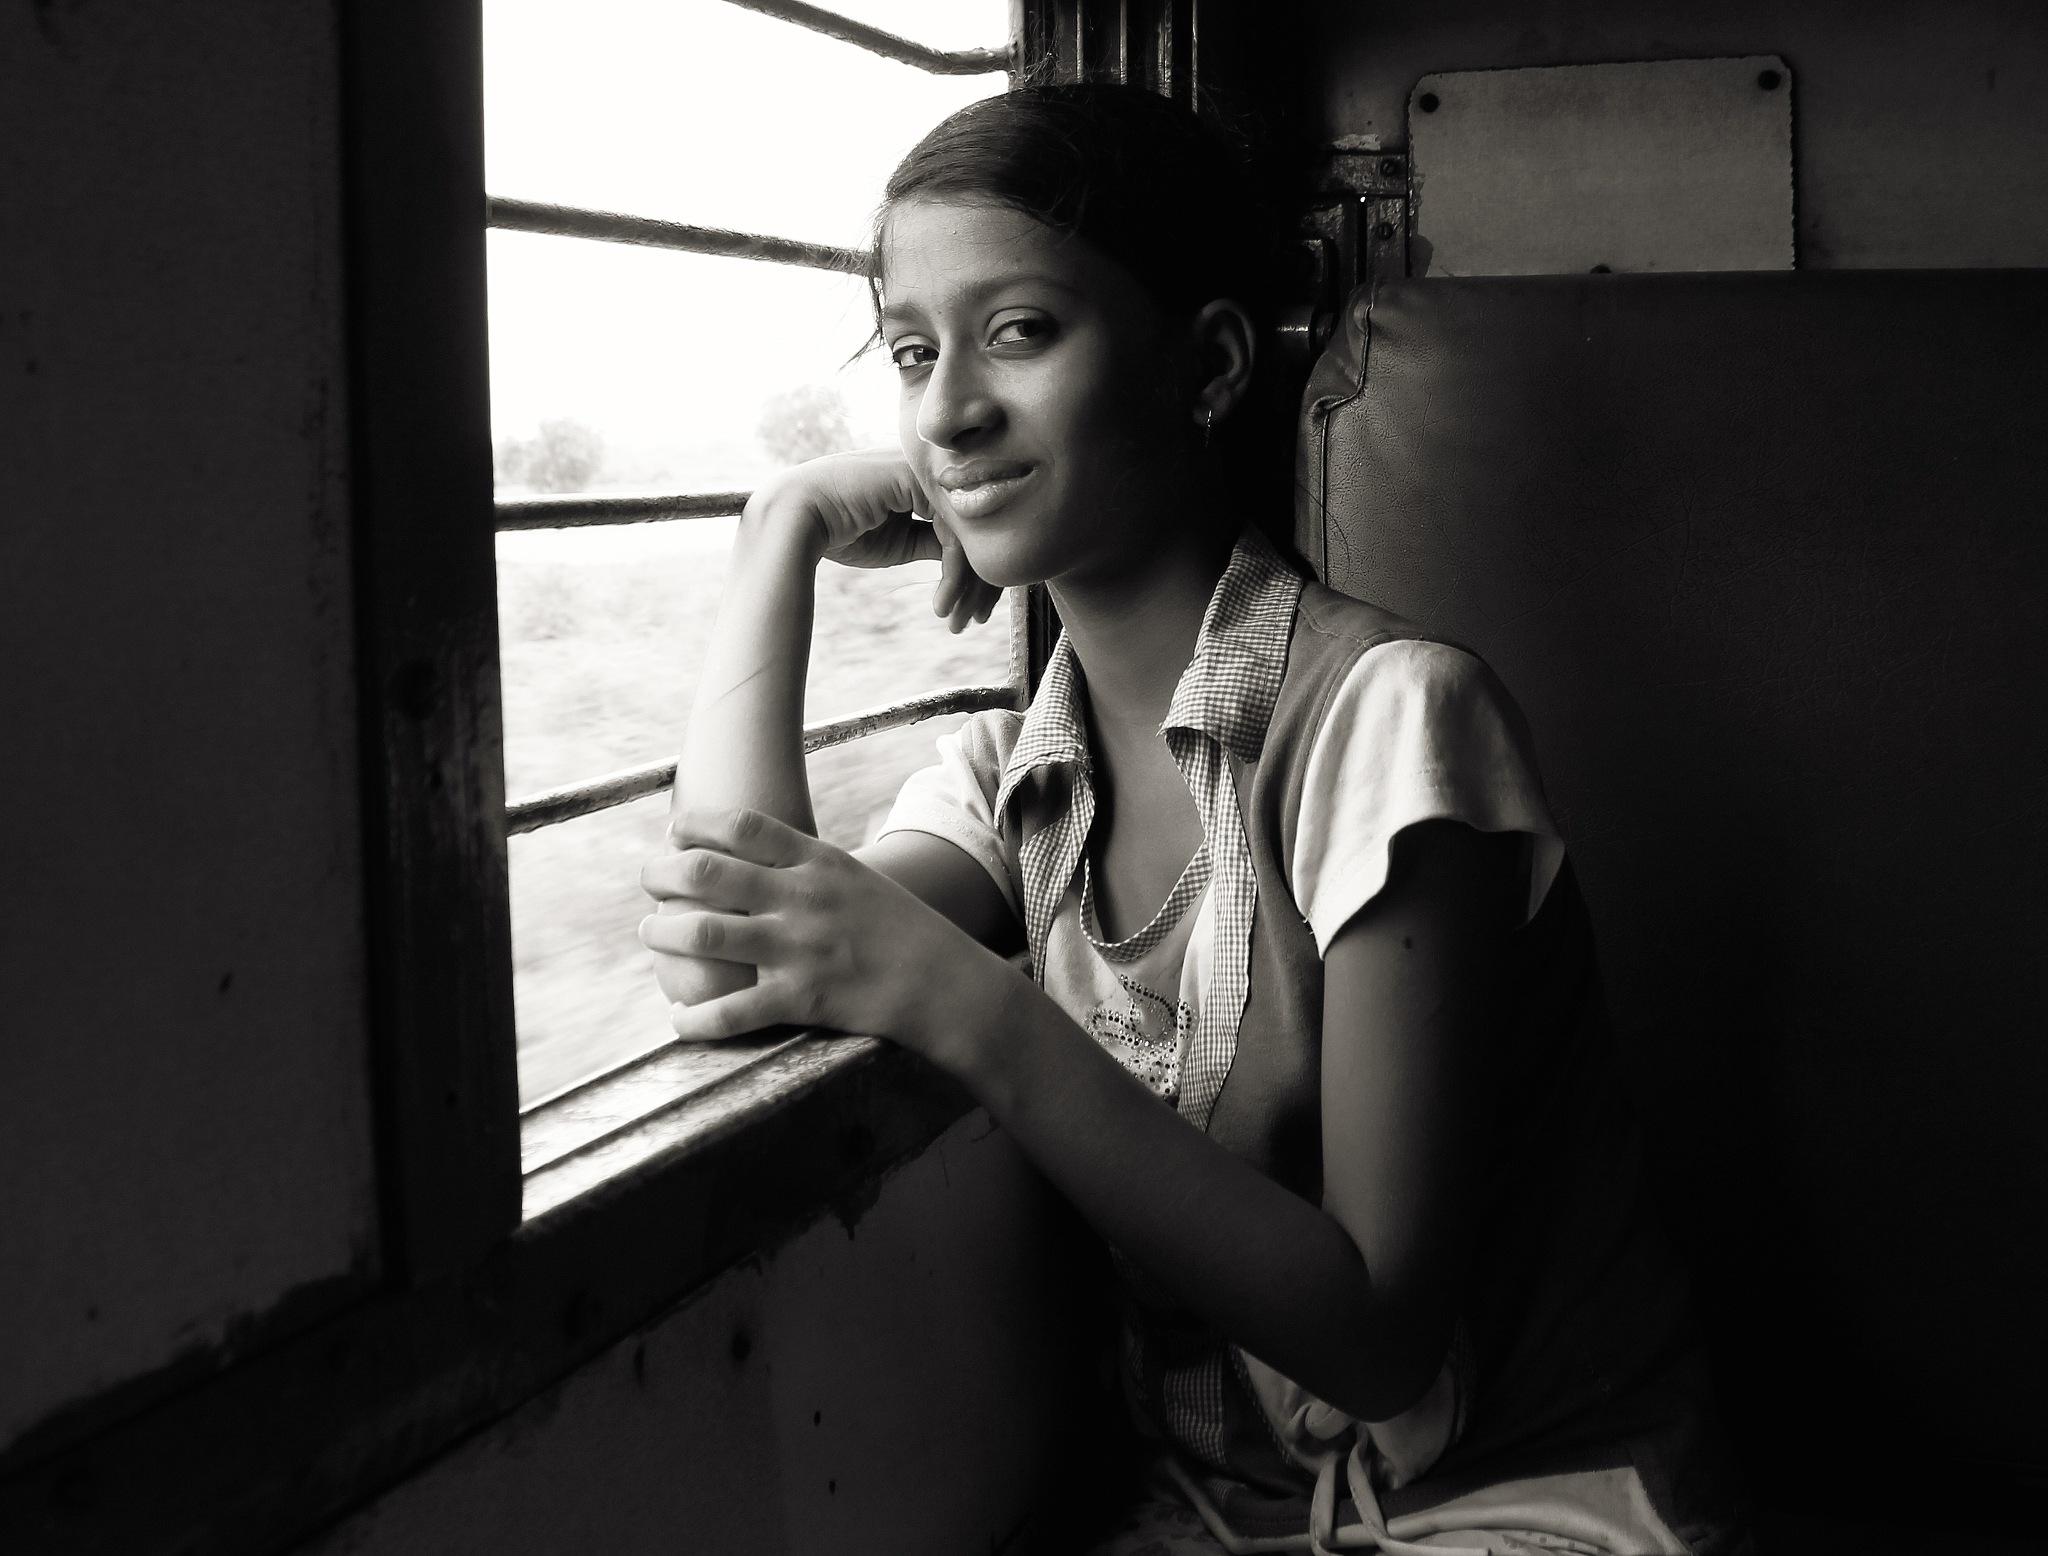 || Smile || by Kunal Bhattacharya